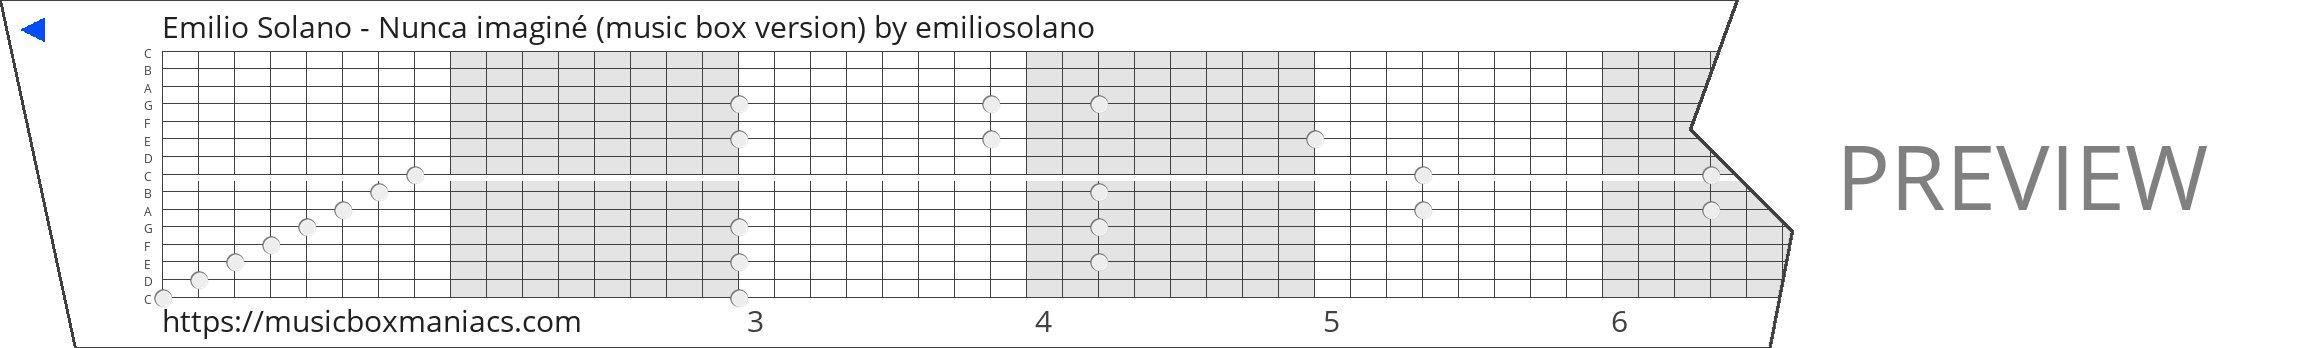 Emilio Solano - Nunca imaginé (music box version) 15 note music box paper strip